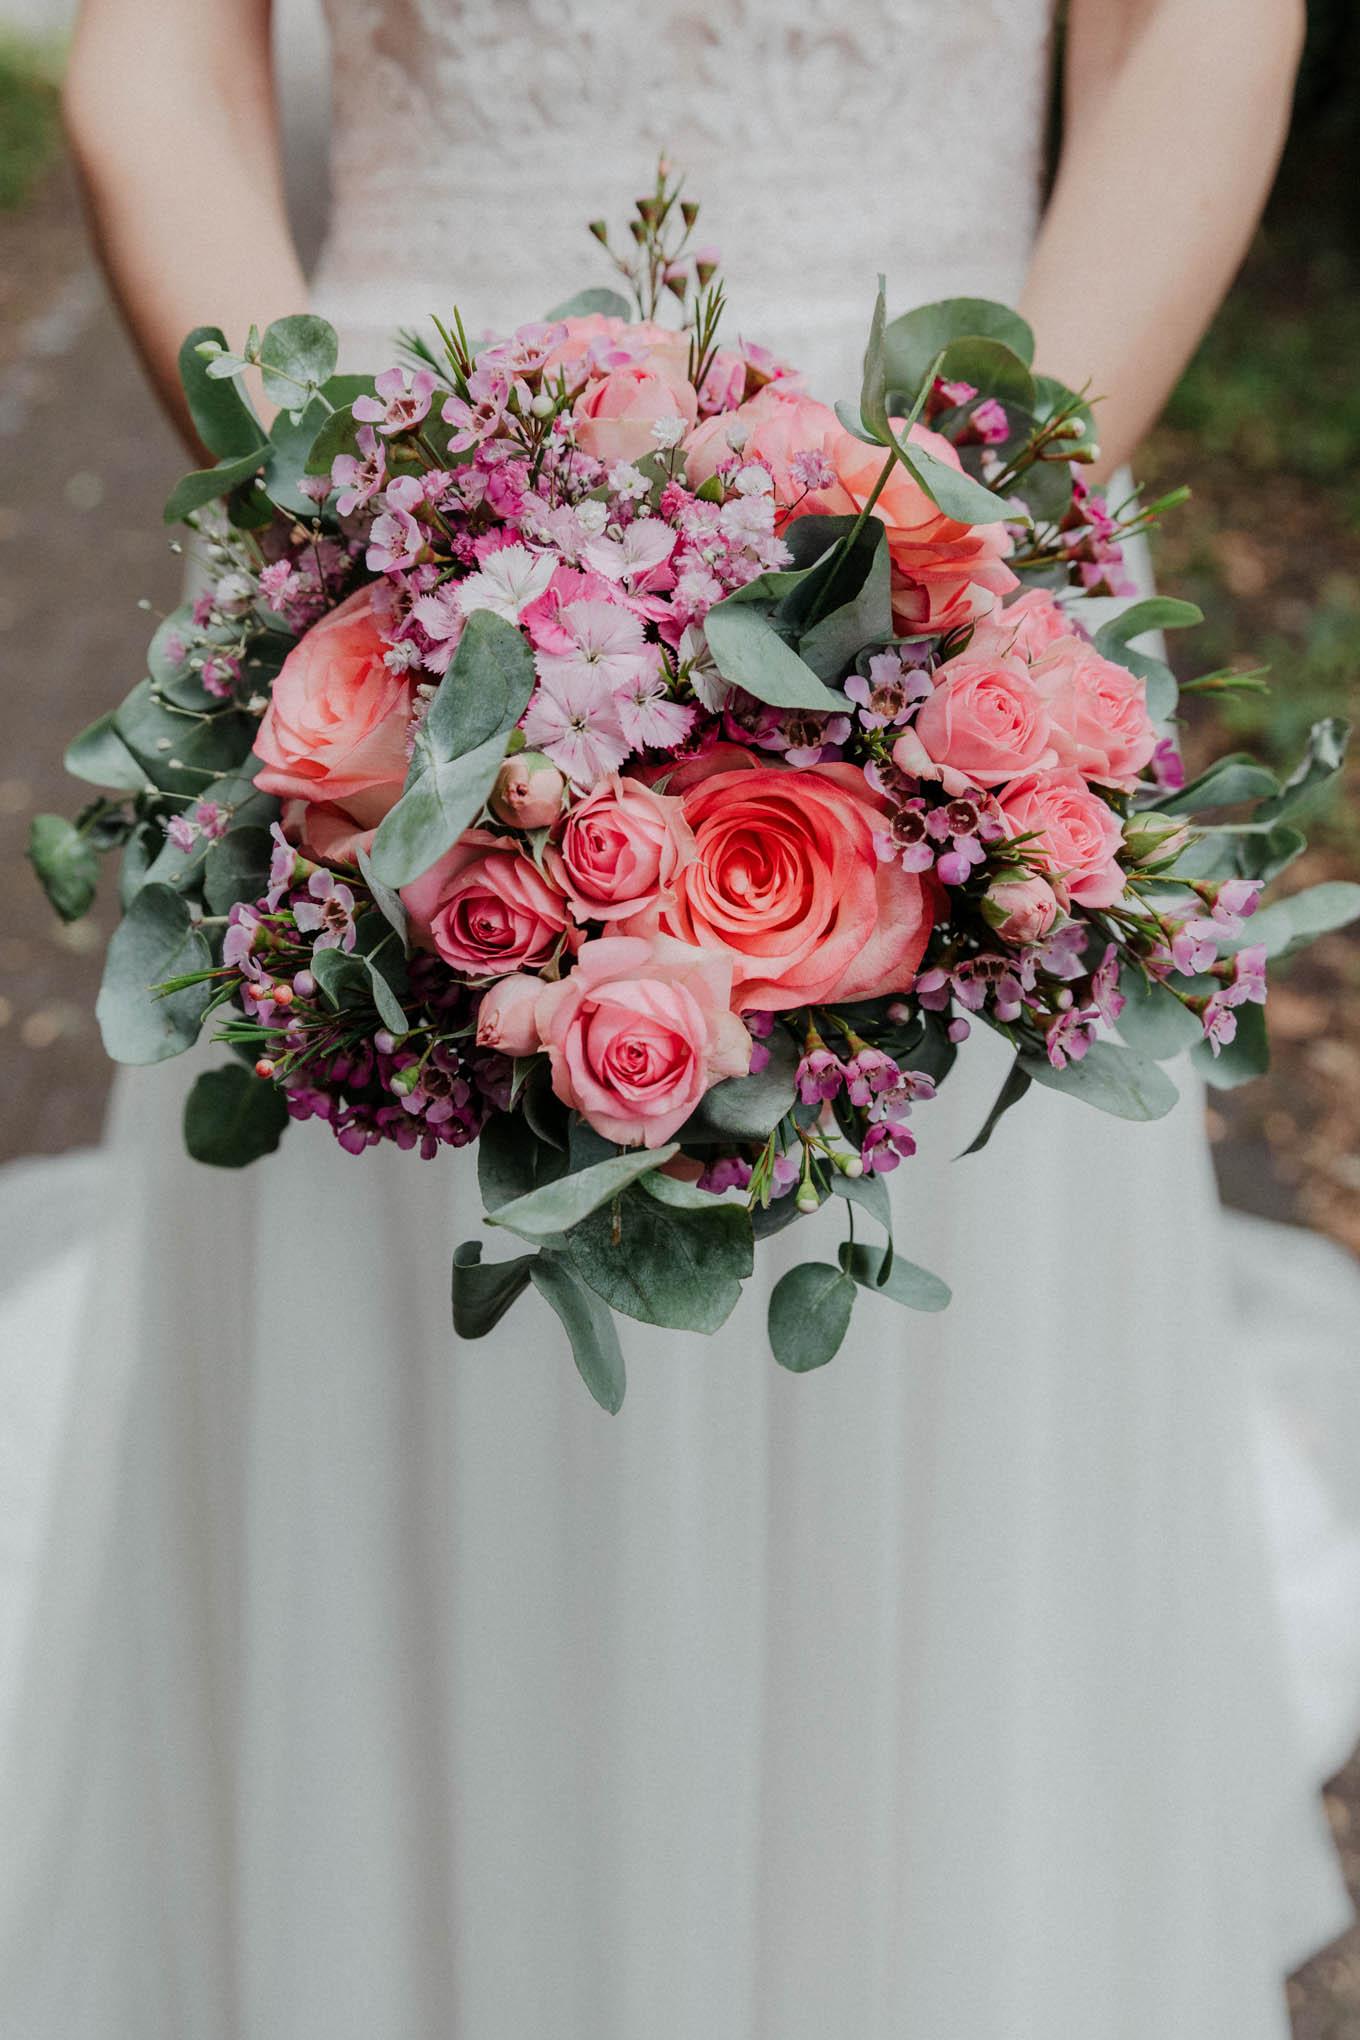 Braut mit Brautstrauß rot